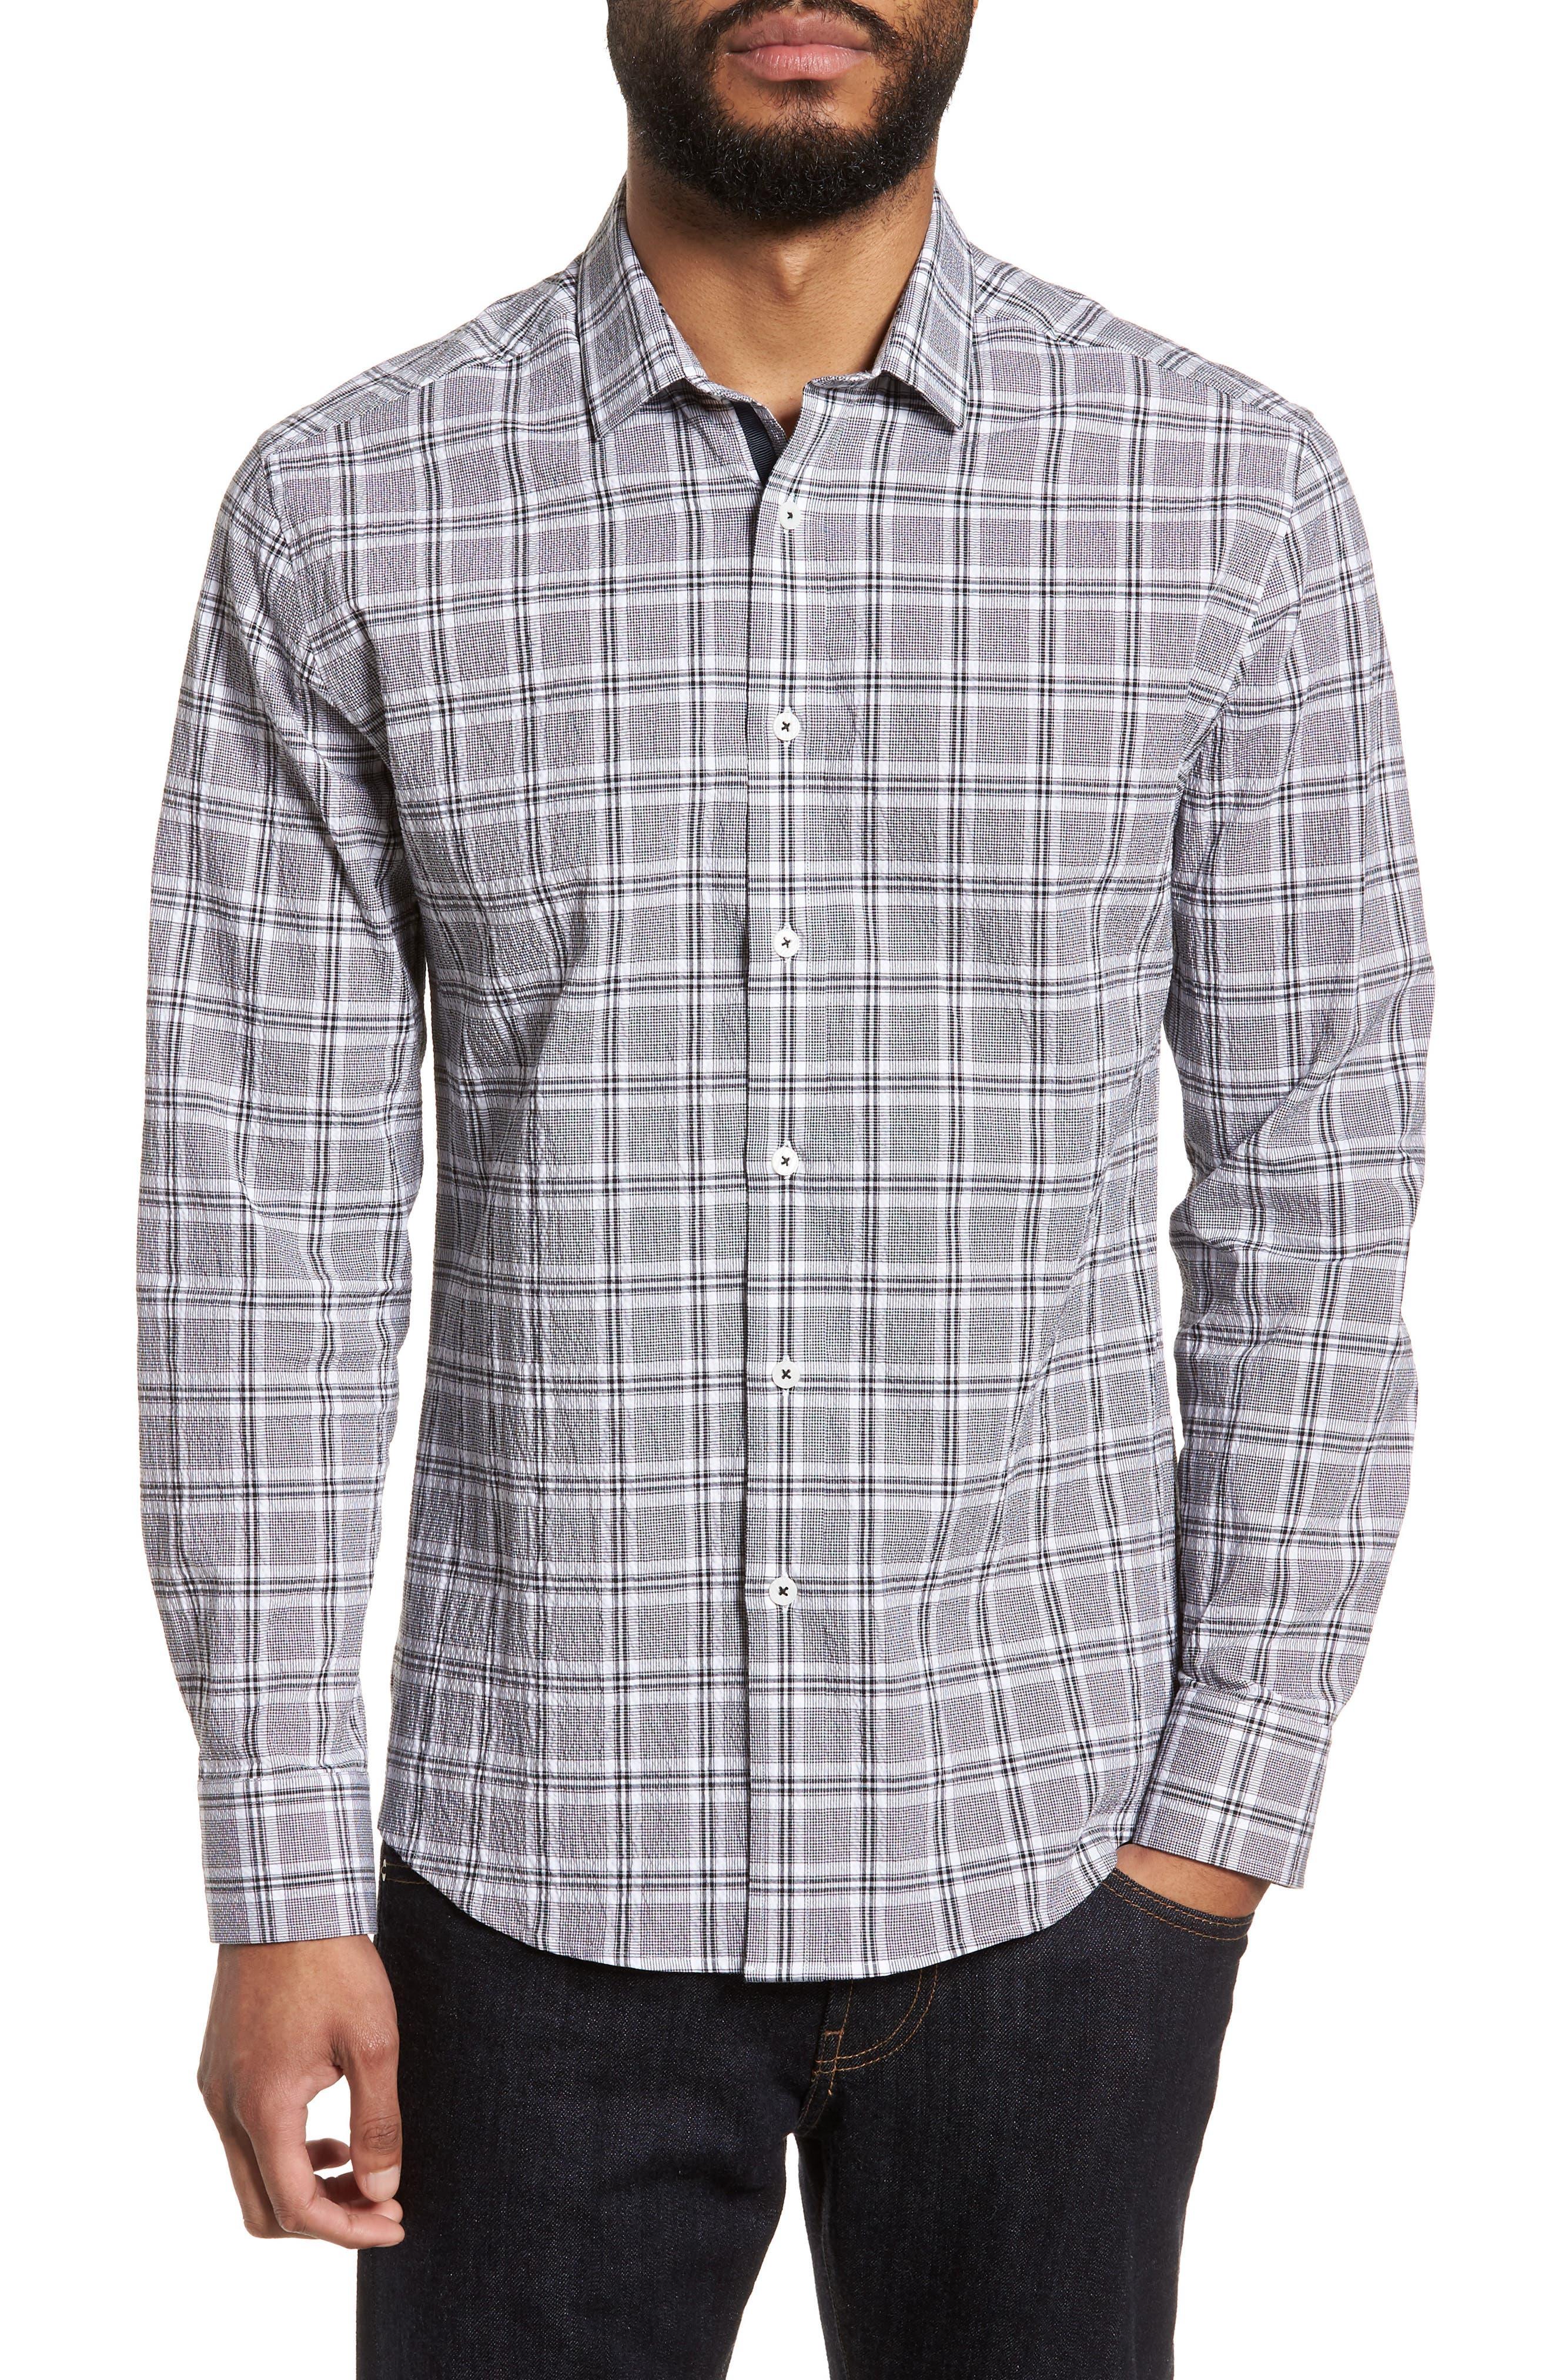 Main Image - Vince Camuto Slim Fit Plaid Seersucker Sport Shirt